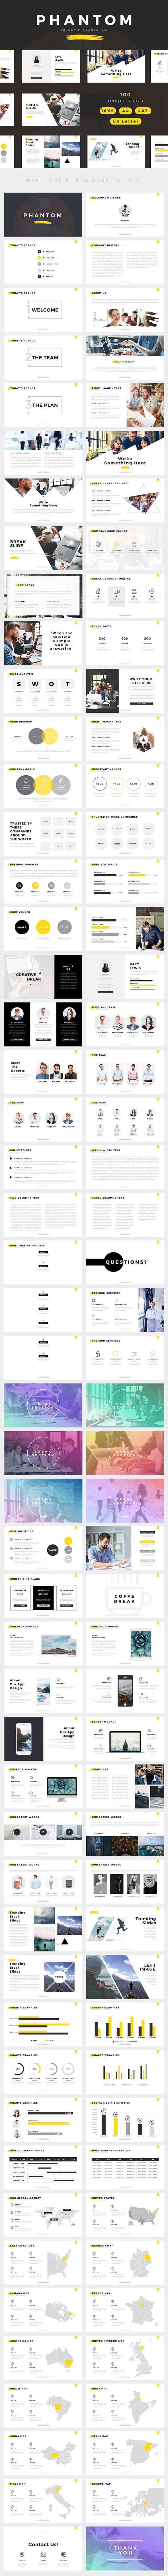 Phantom Modern Powerpoint Template - Creative PowerPoint Templates Download here:  https://graphicriver.net/item/phantom-modern-powerpoint-template/18705353?ref=classicdesignp